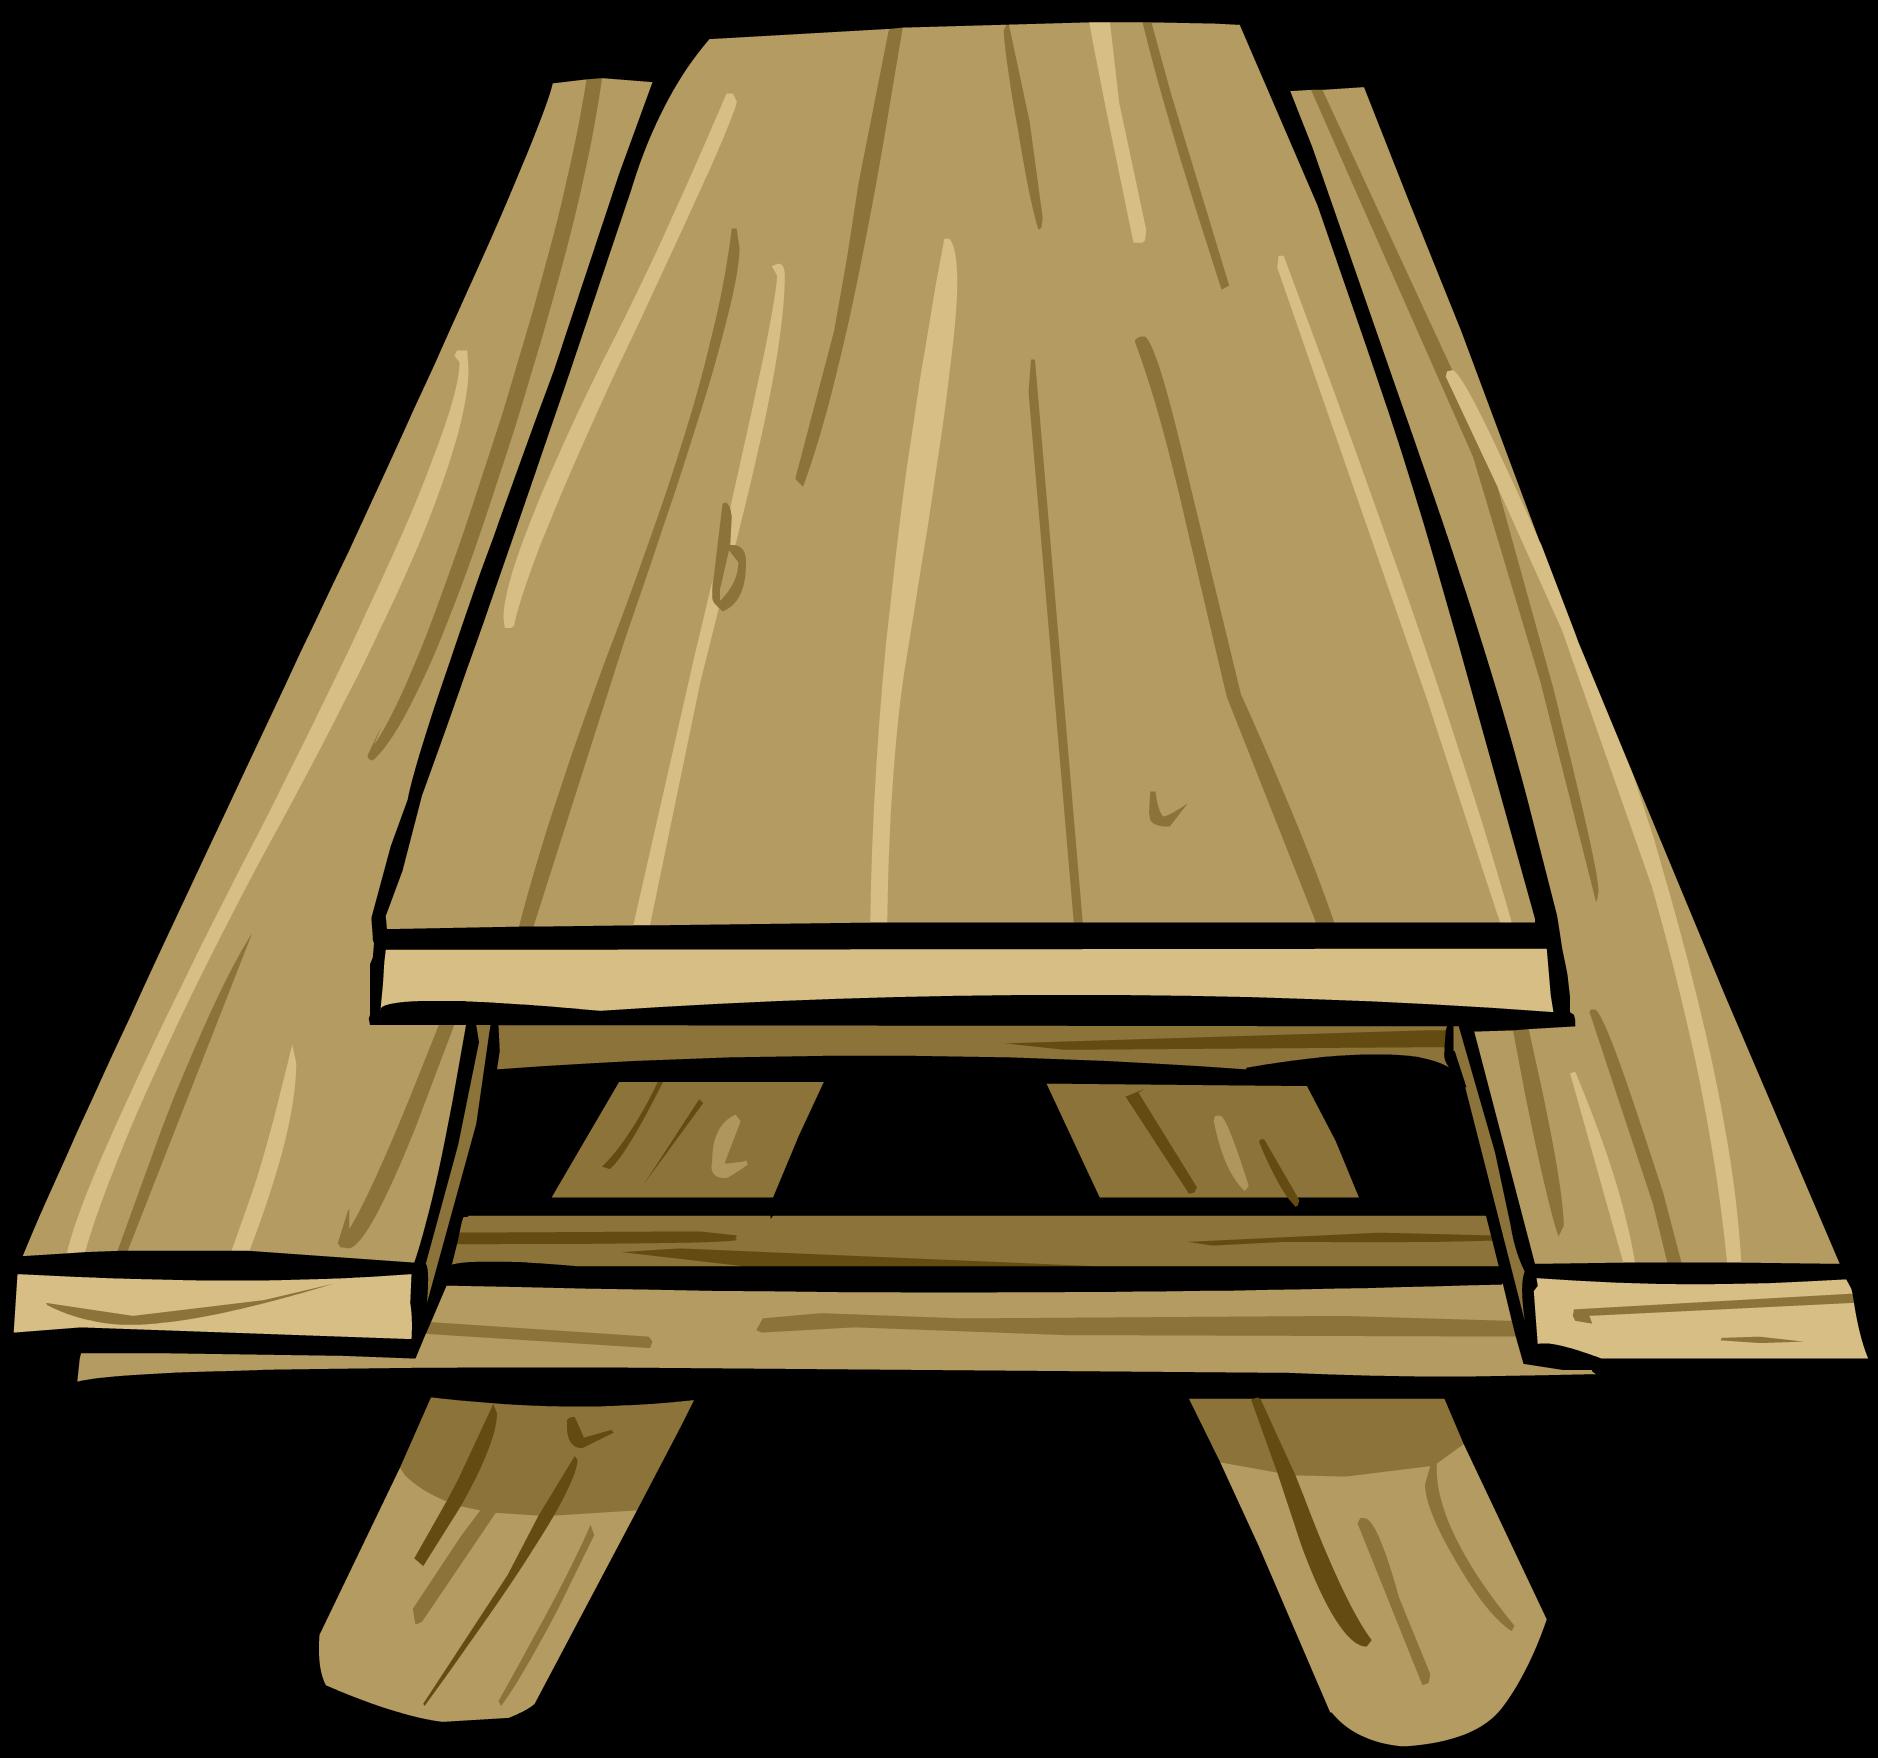 Image Picnic Table Png Club Penguin Wiki Fandom